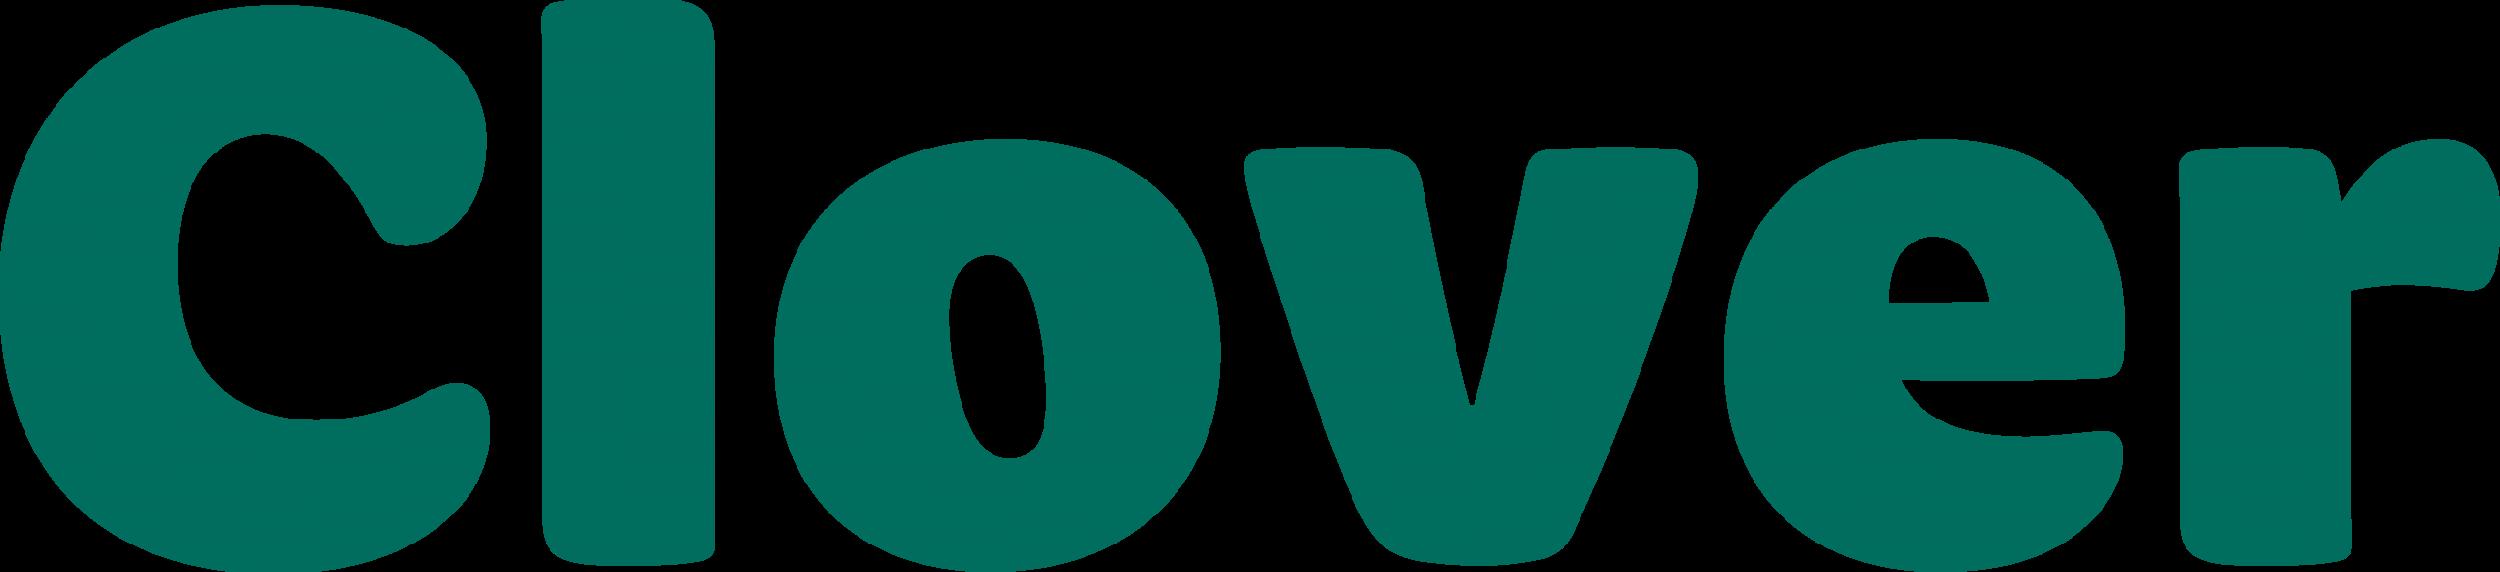 Clover_Logo_Green_RGB_Large.png